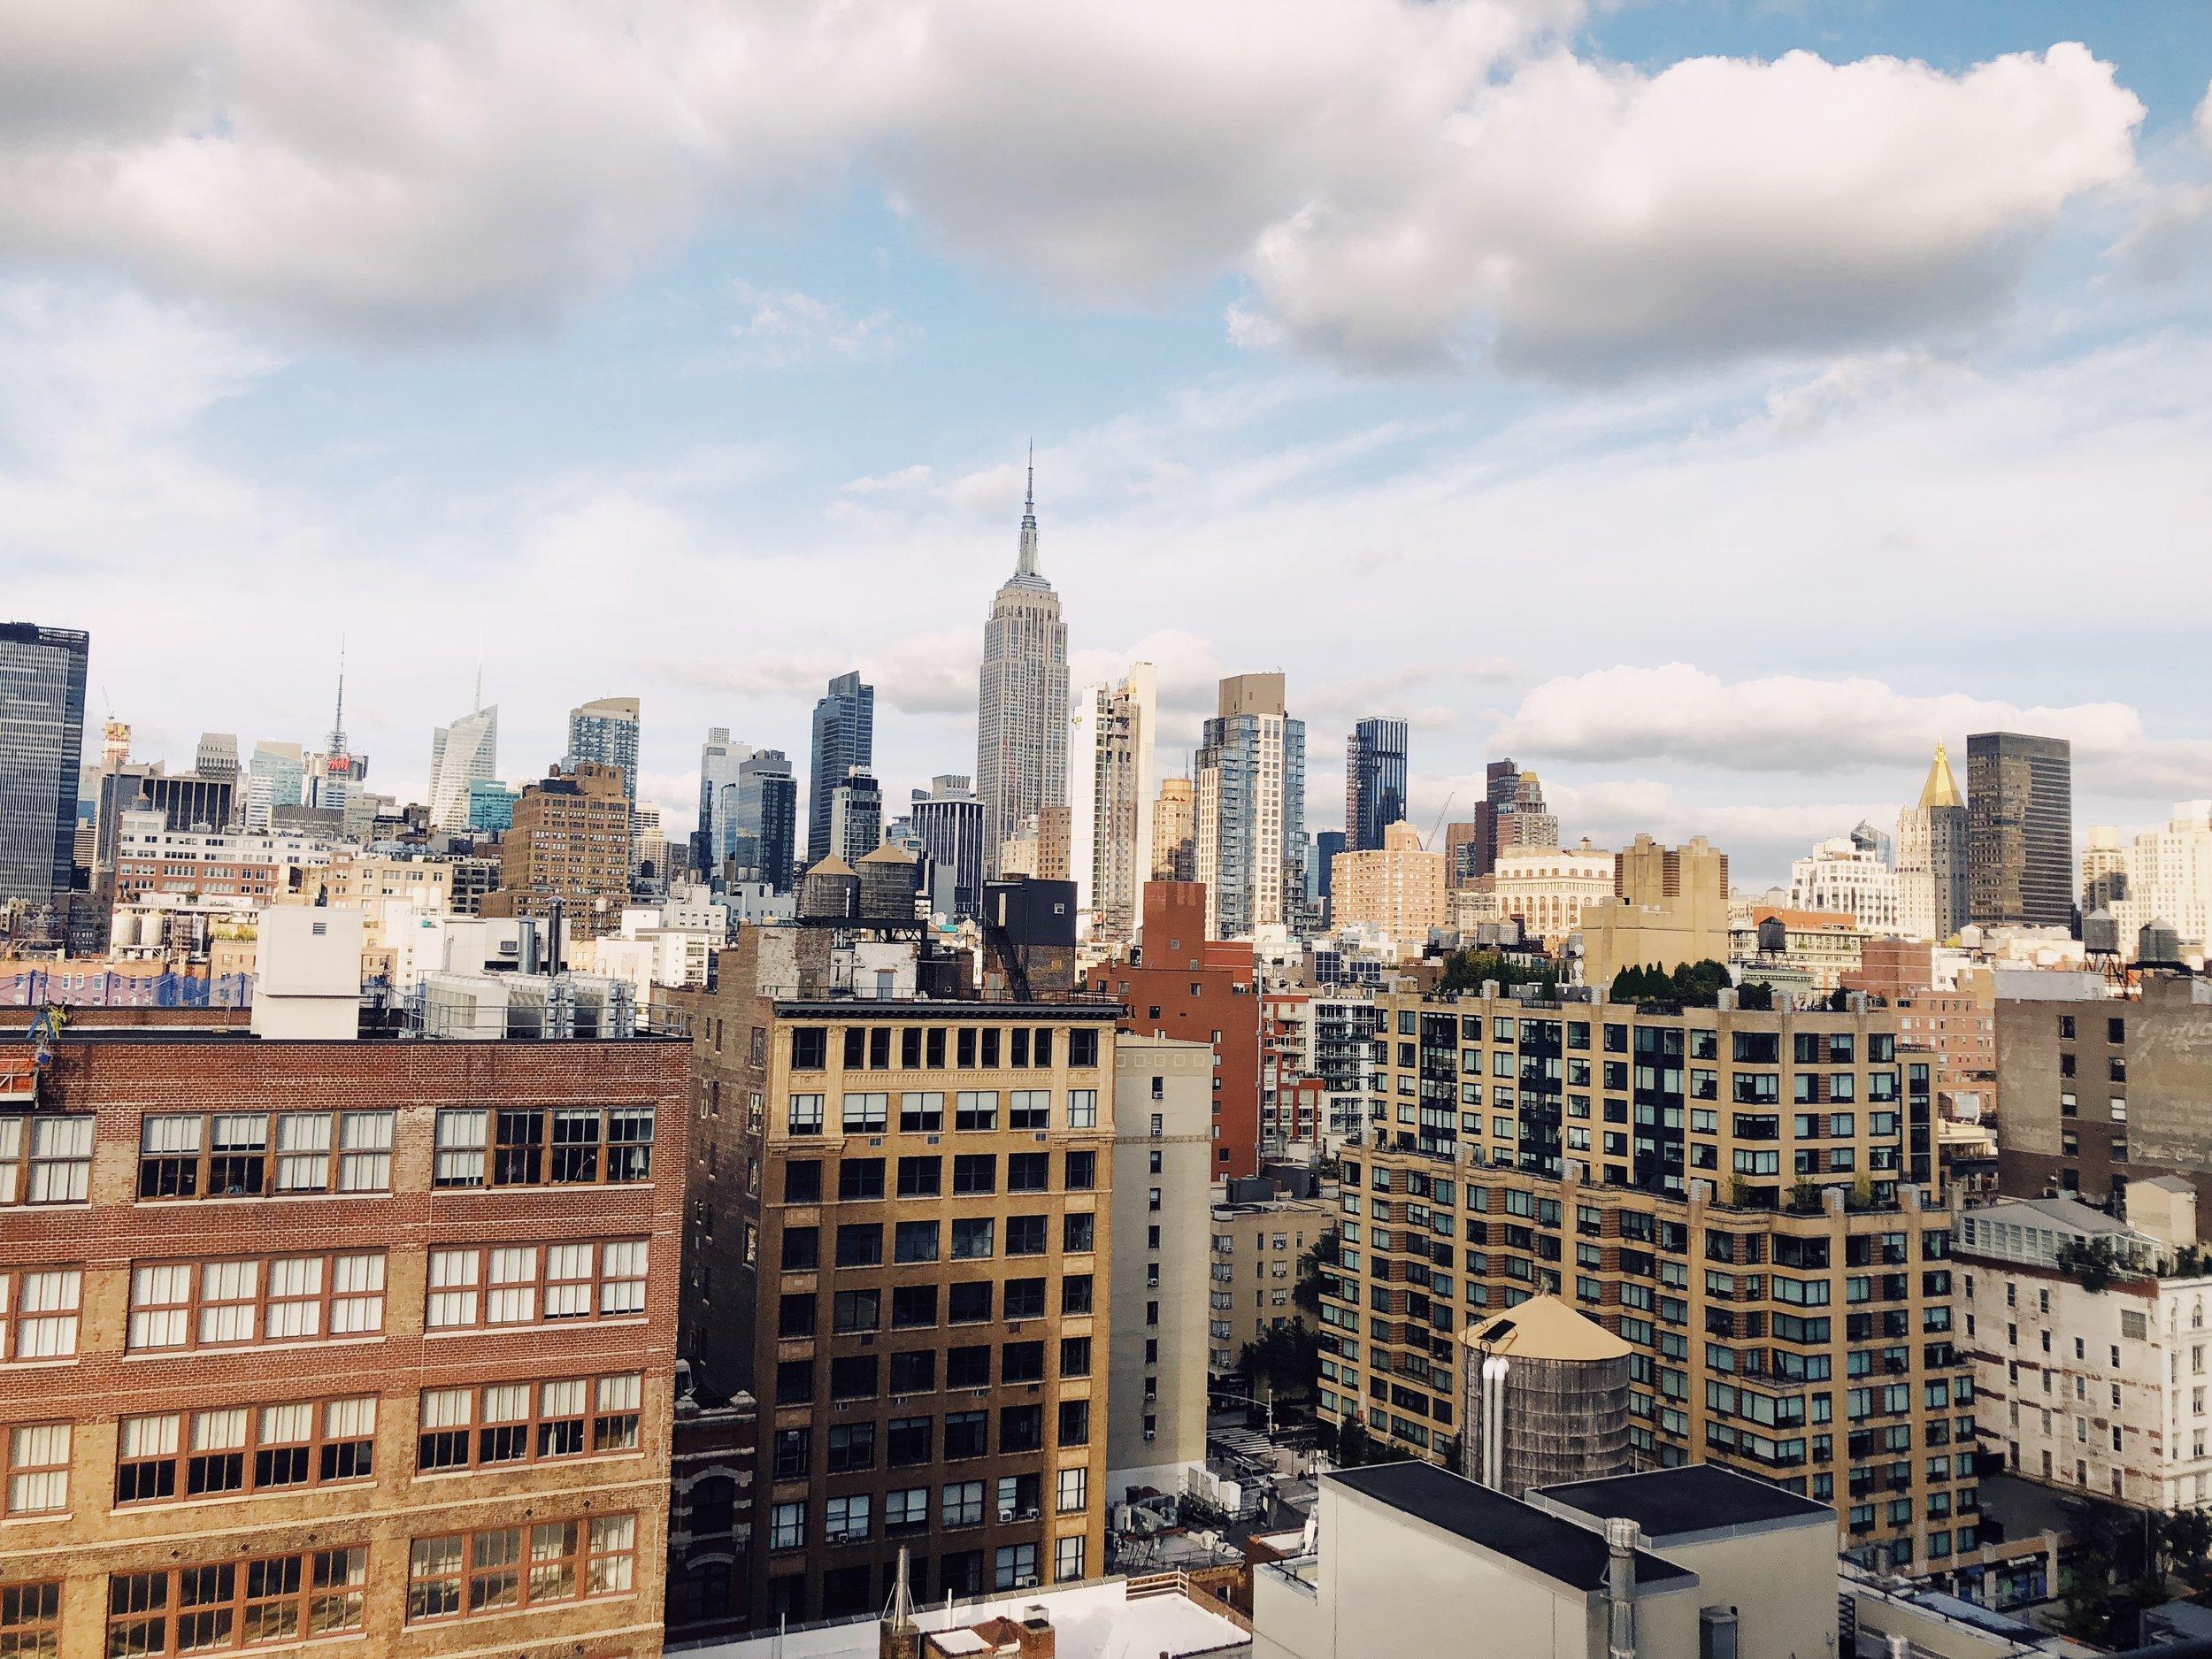 MANHATTAN / NEW YORK